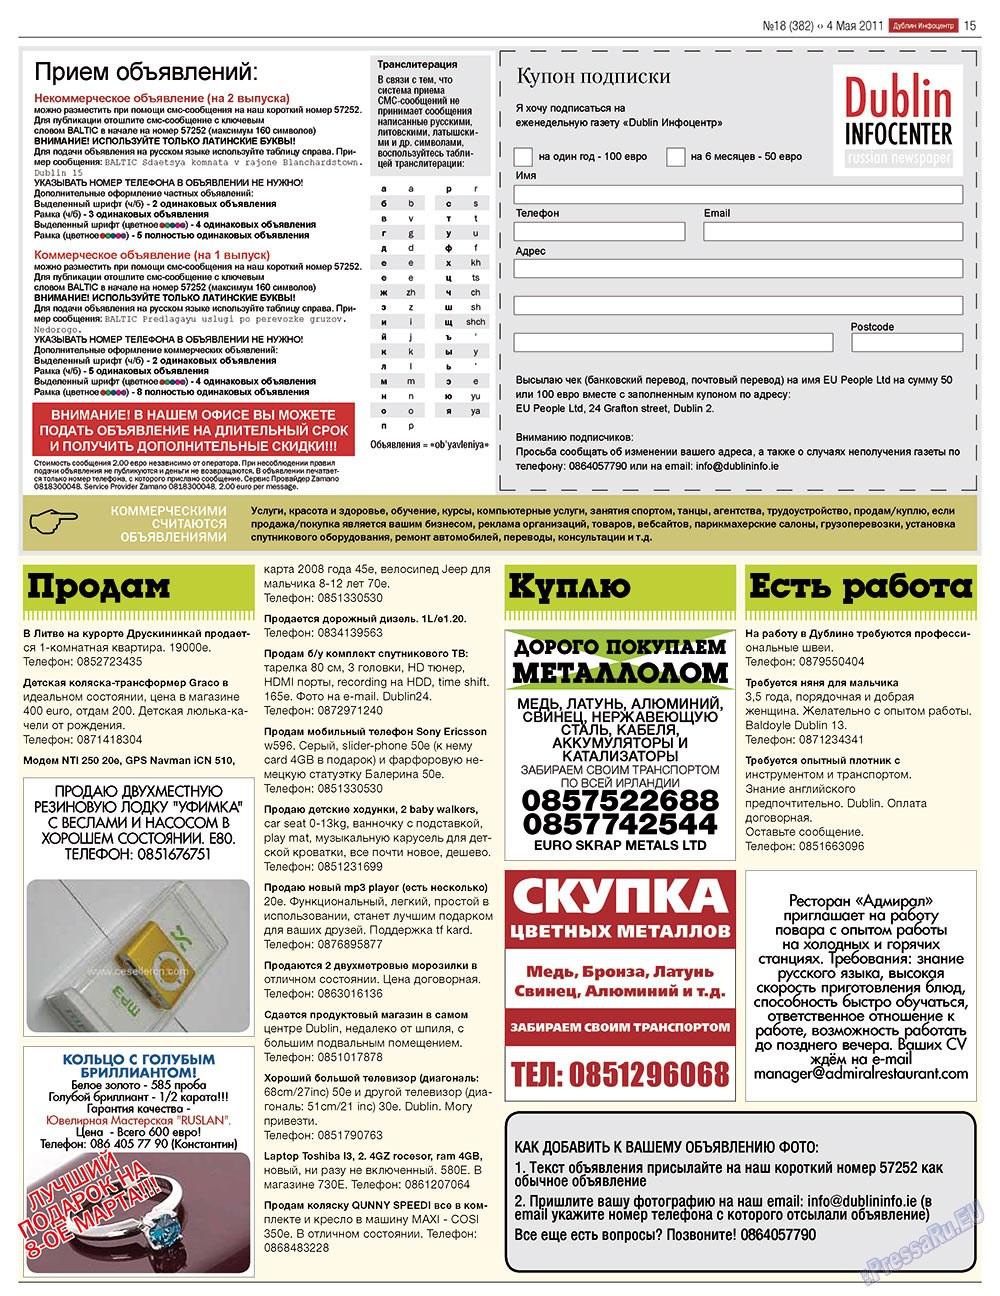 Дублин инфоцентр (газета). 2011 год, номер 18, стр. 15